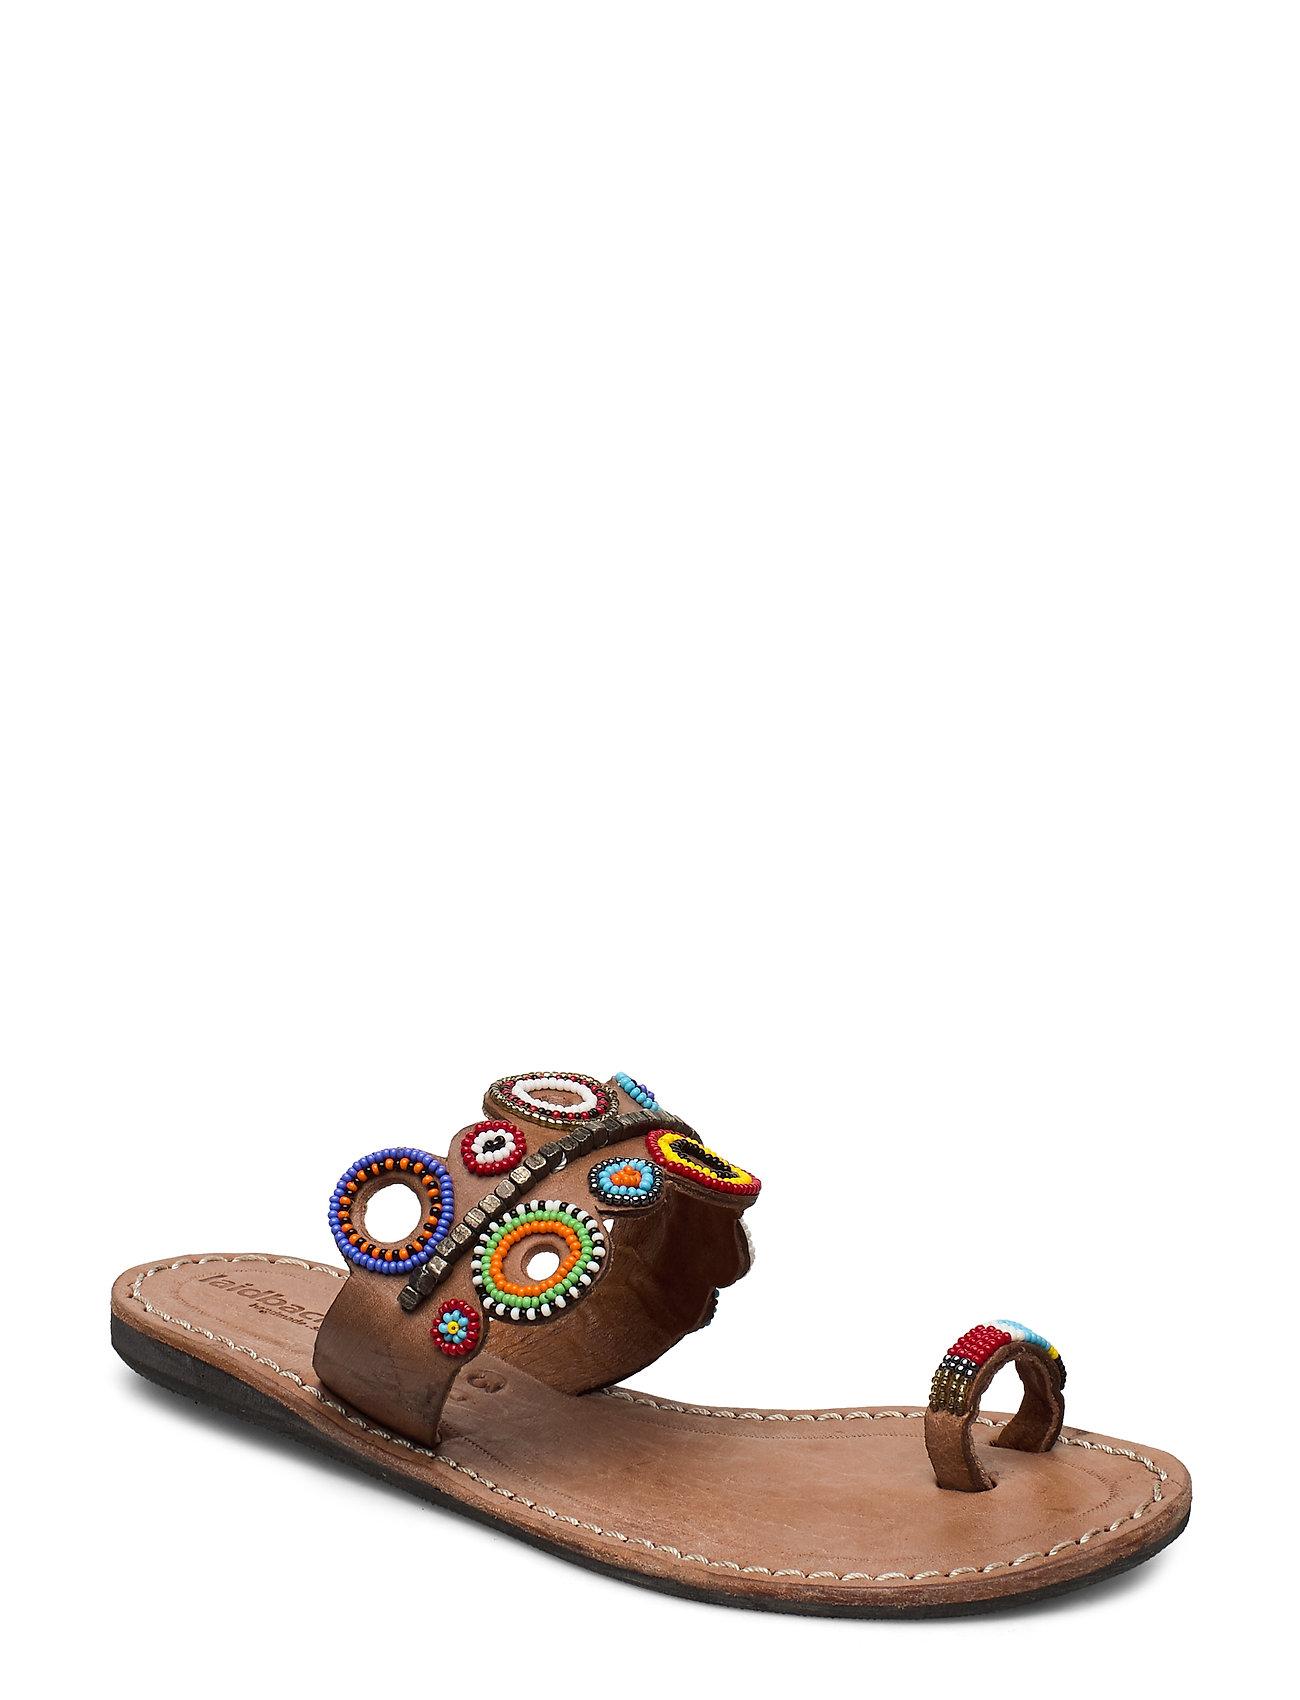 Image of Cloud Flat Shoes Summer Shoes Flat Sandals Brun Laidback London (3455508013)